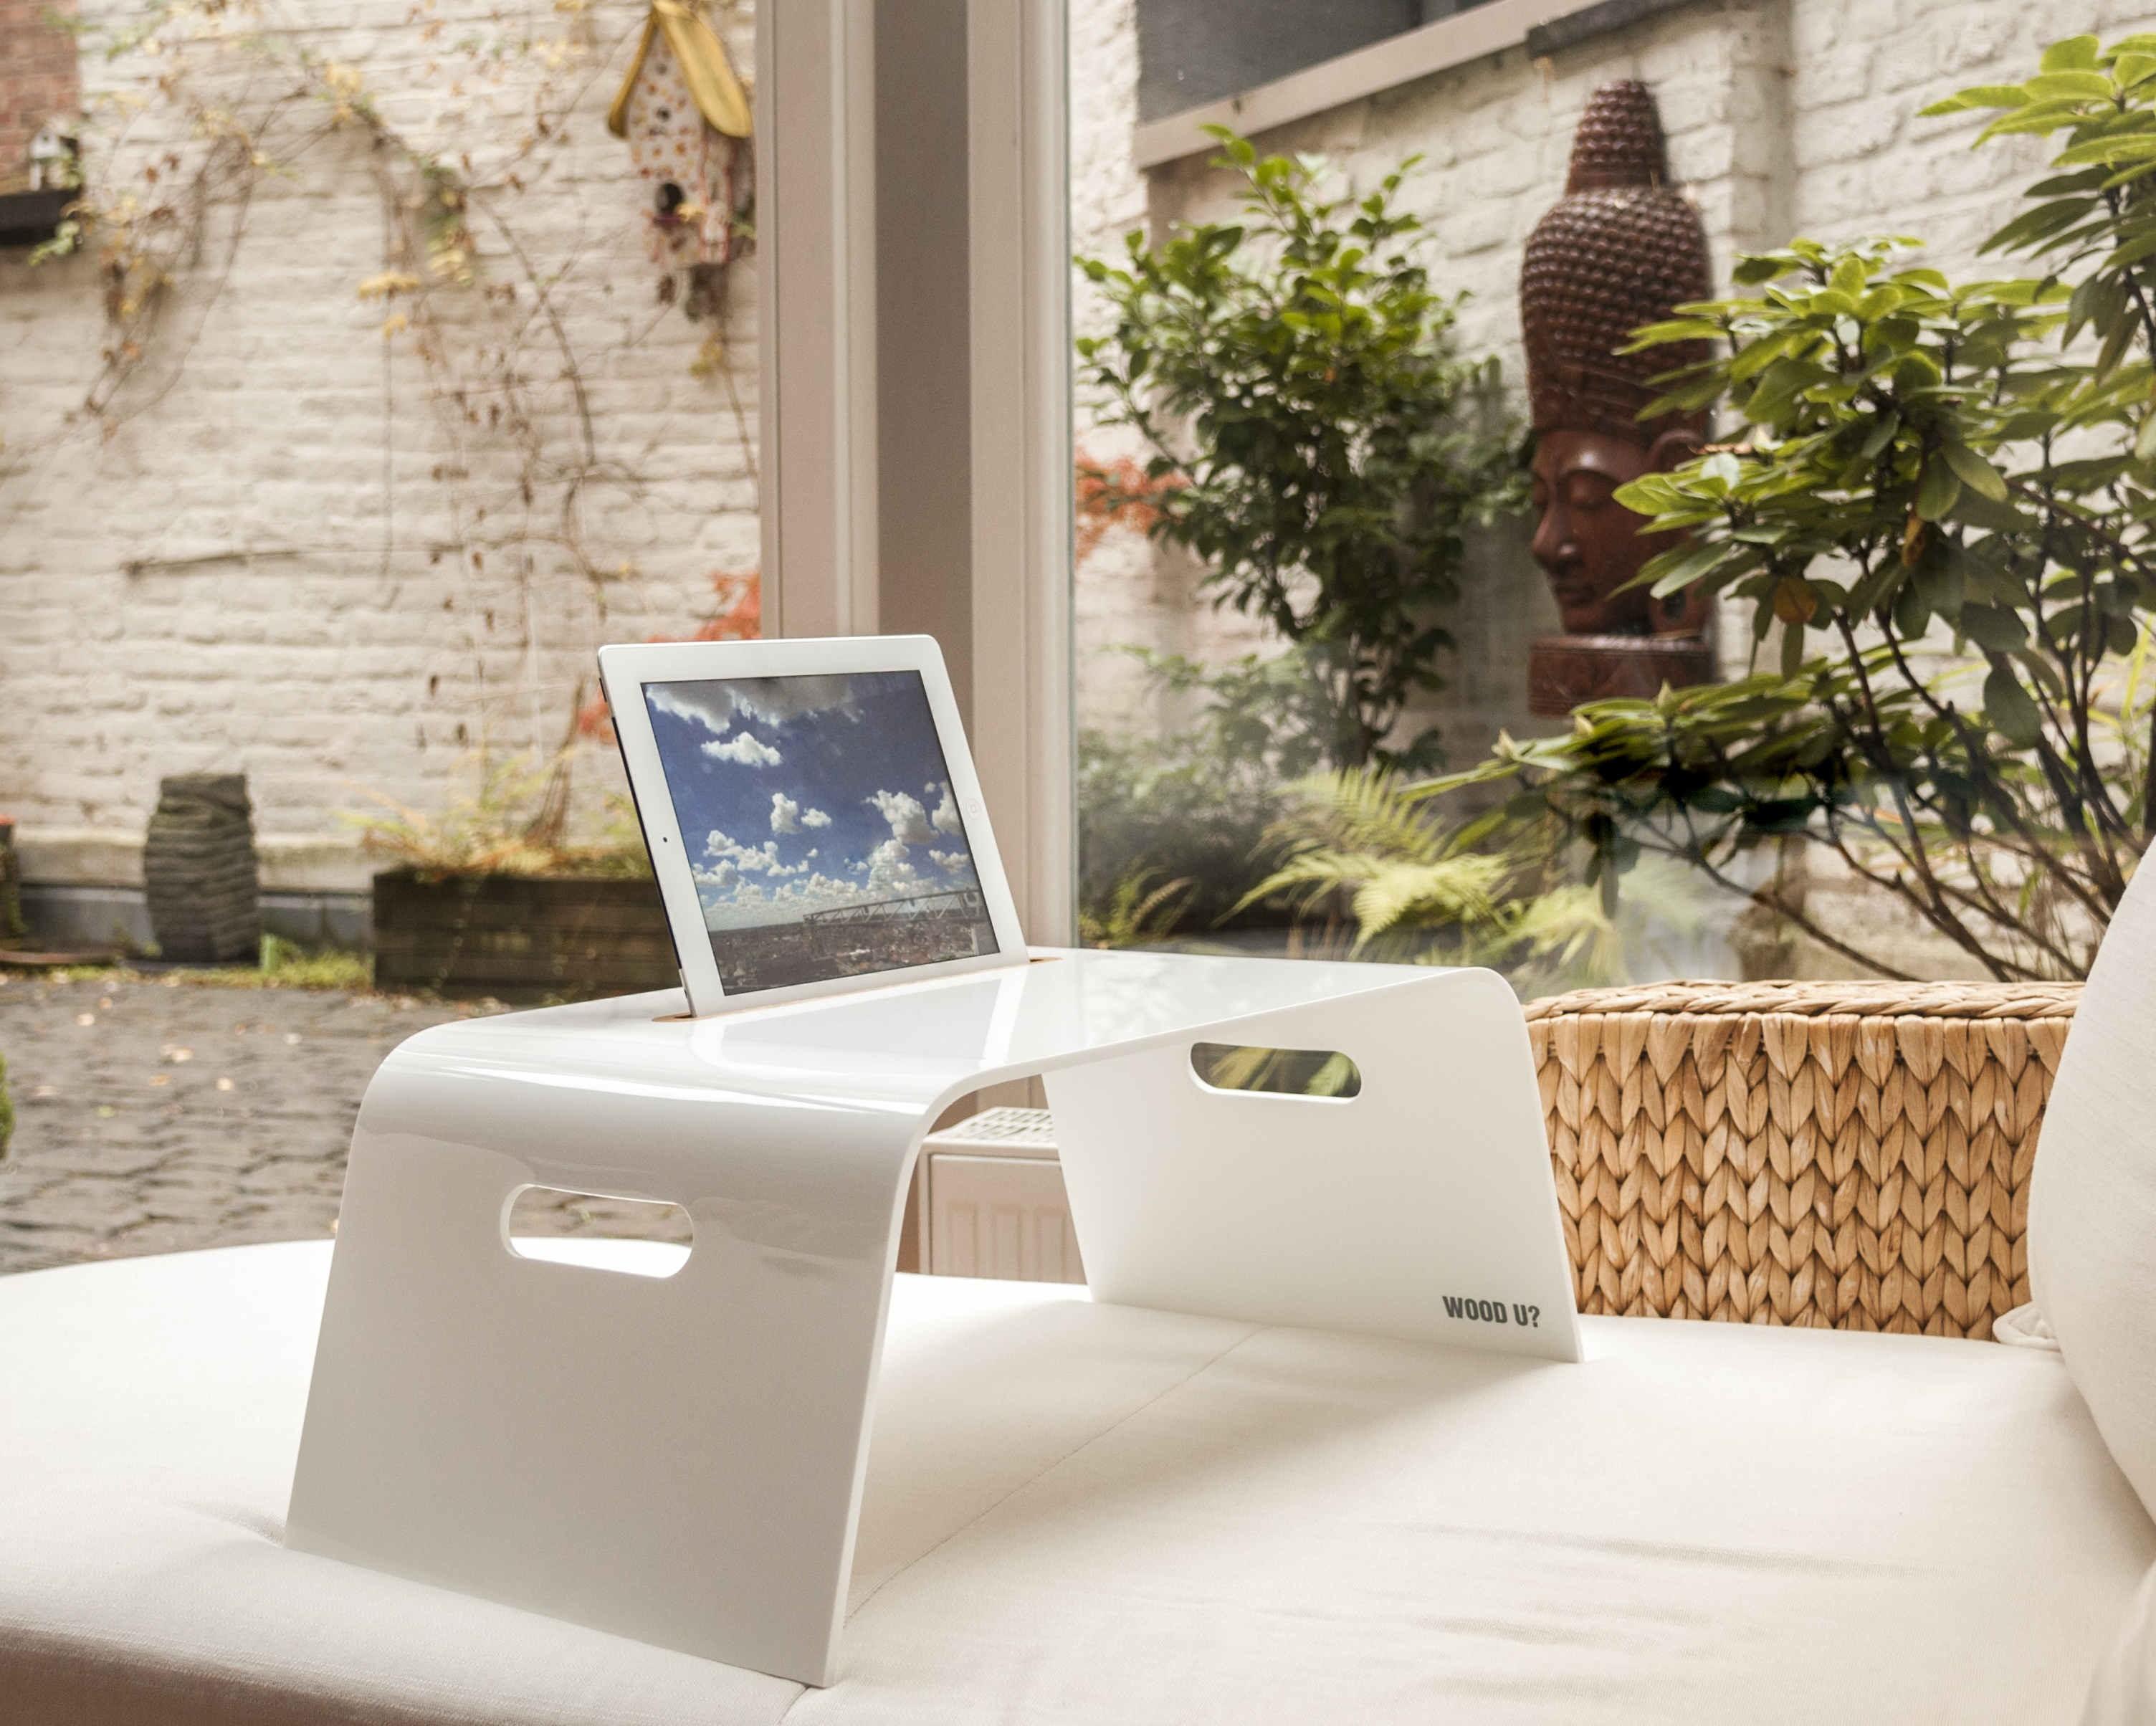 wood u chill halterung f r ipad und tablets f r das bett. Black Bedroom Furniture Sets. Home Design Ideas